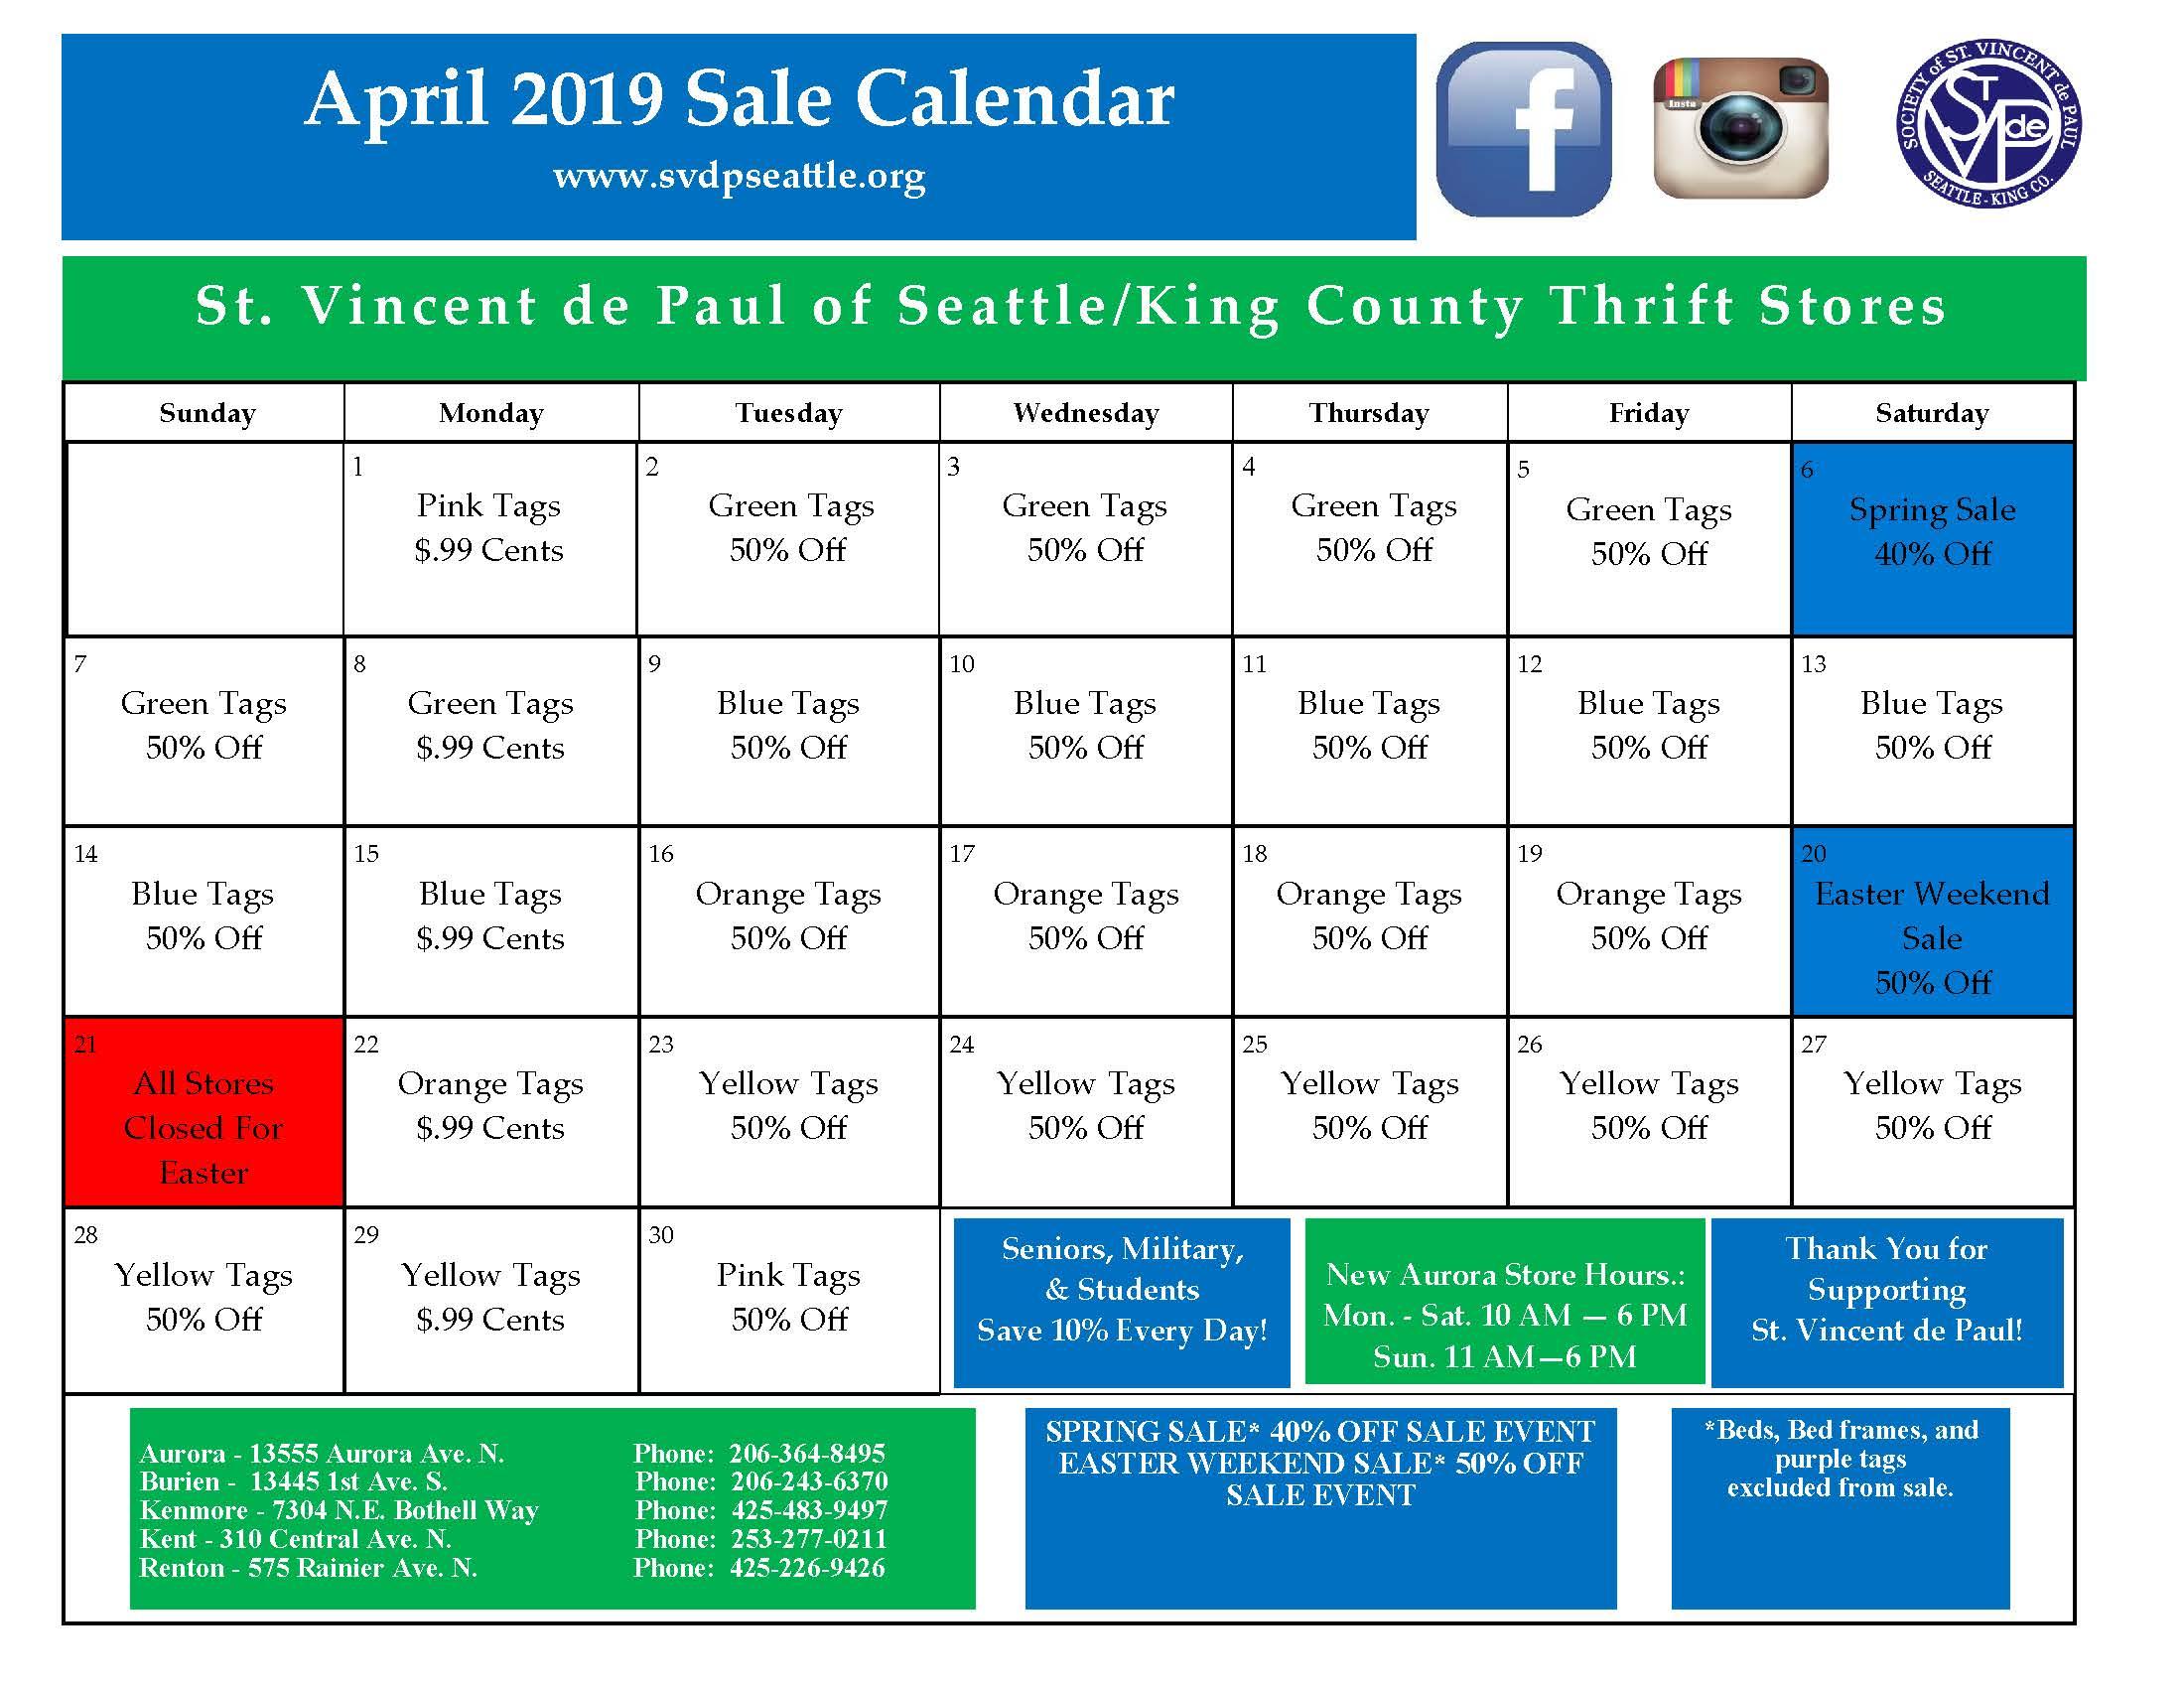 APRIL 2019 CALENDAR 3-27-19